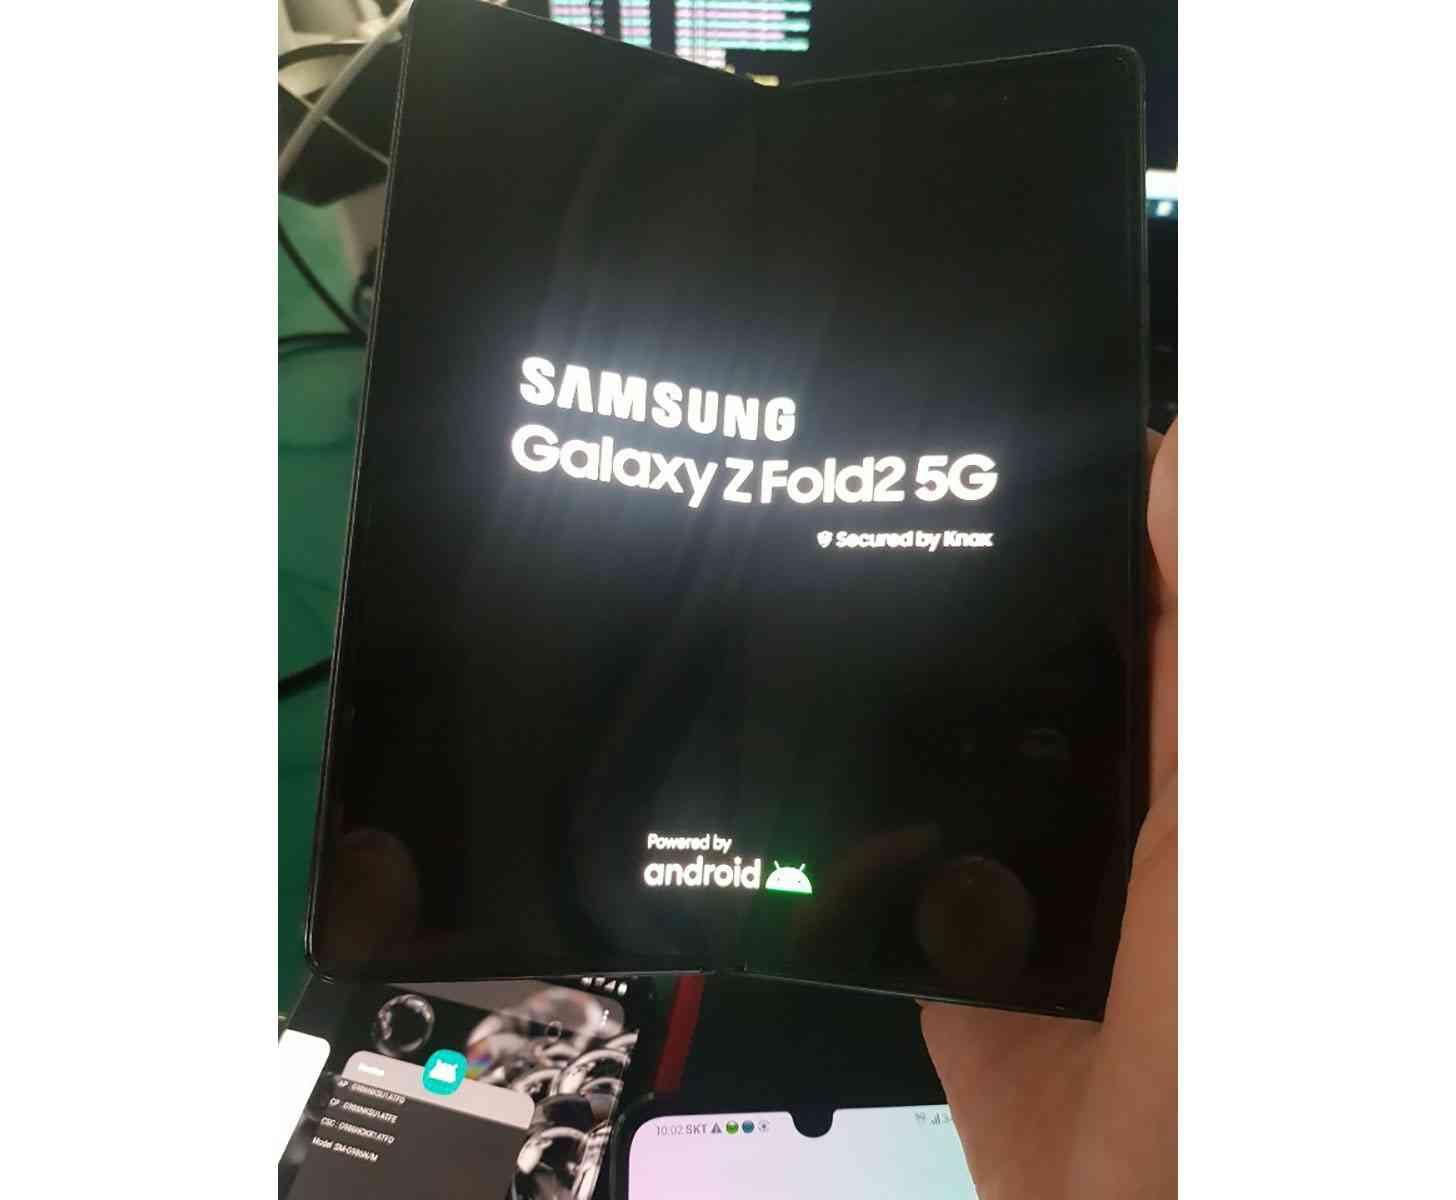 Samsung Galaxy Z Fold 2 hands-on photo leak